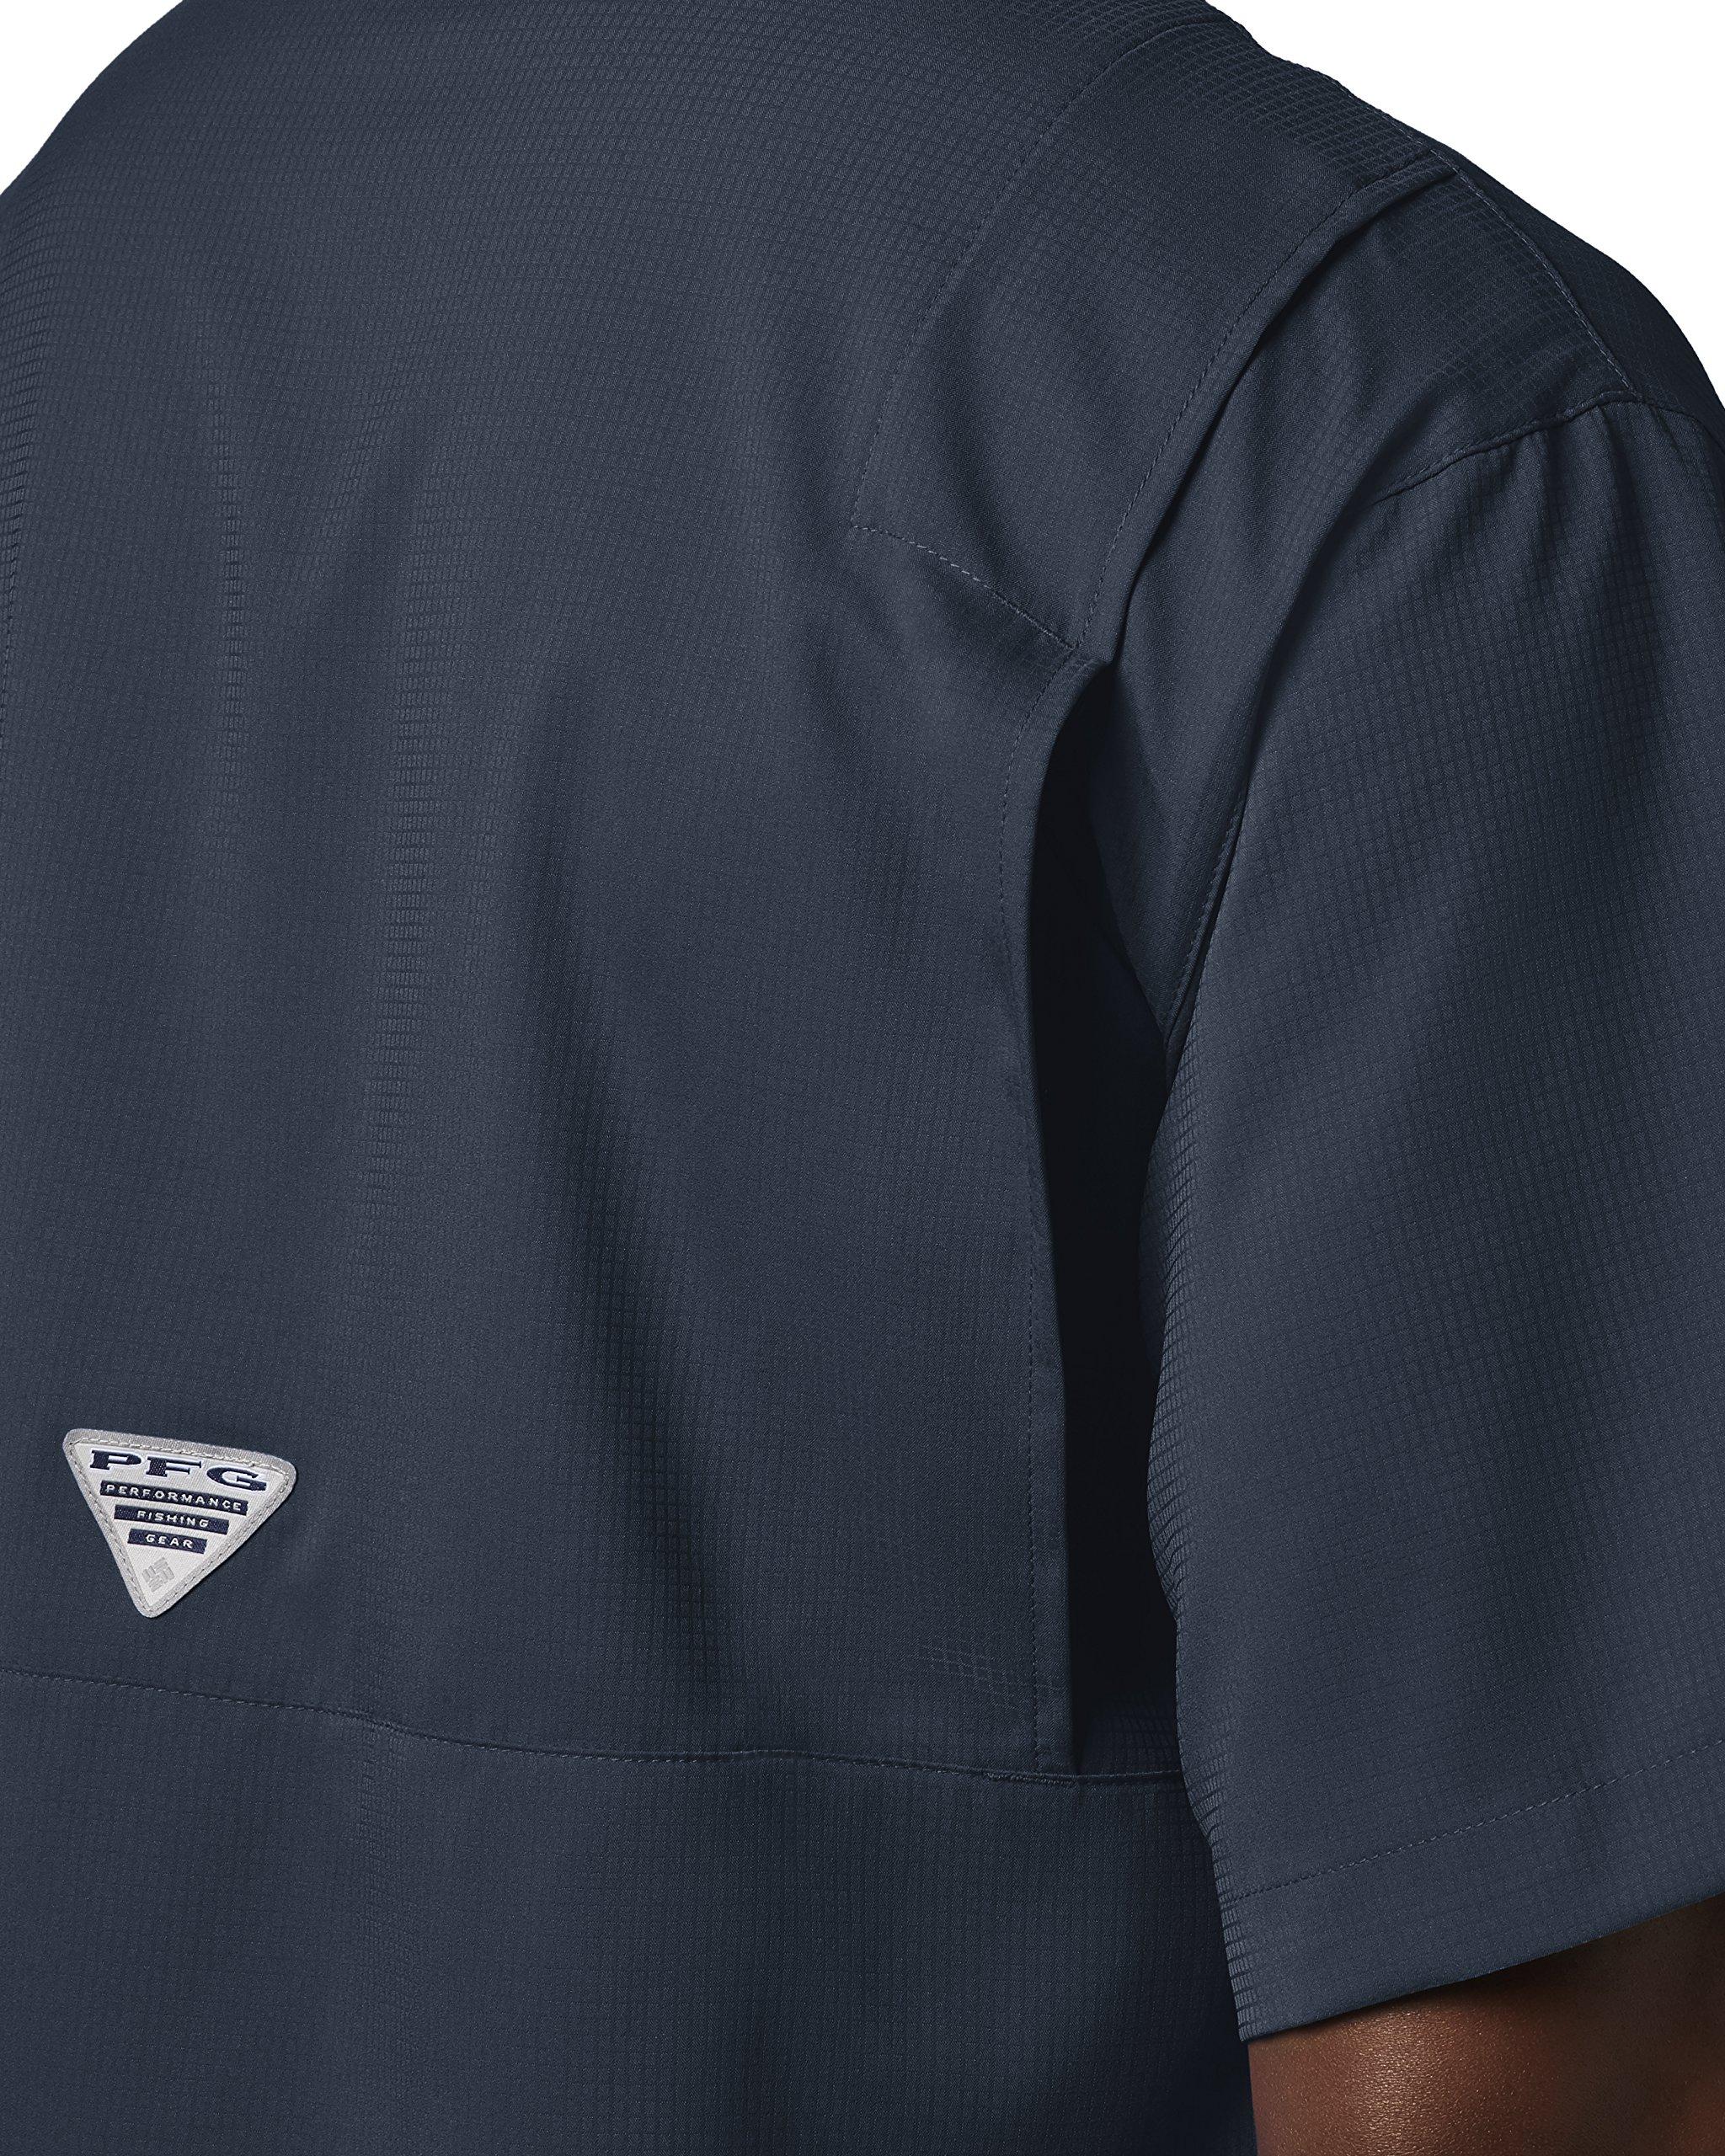 Columbia Men's Tamiami II Short Sleeve Fishing Shirt, Collegiate Navy, X-Small by Columbia (Image #5)